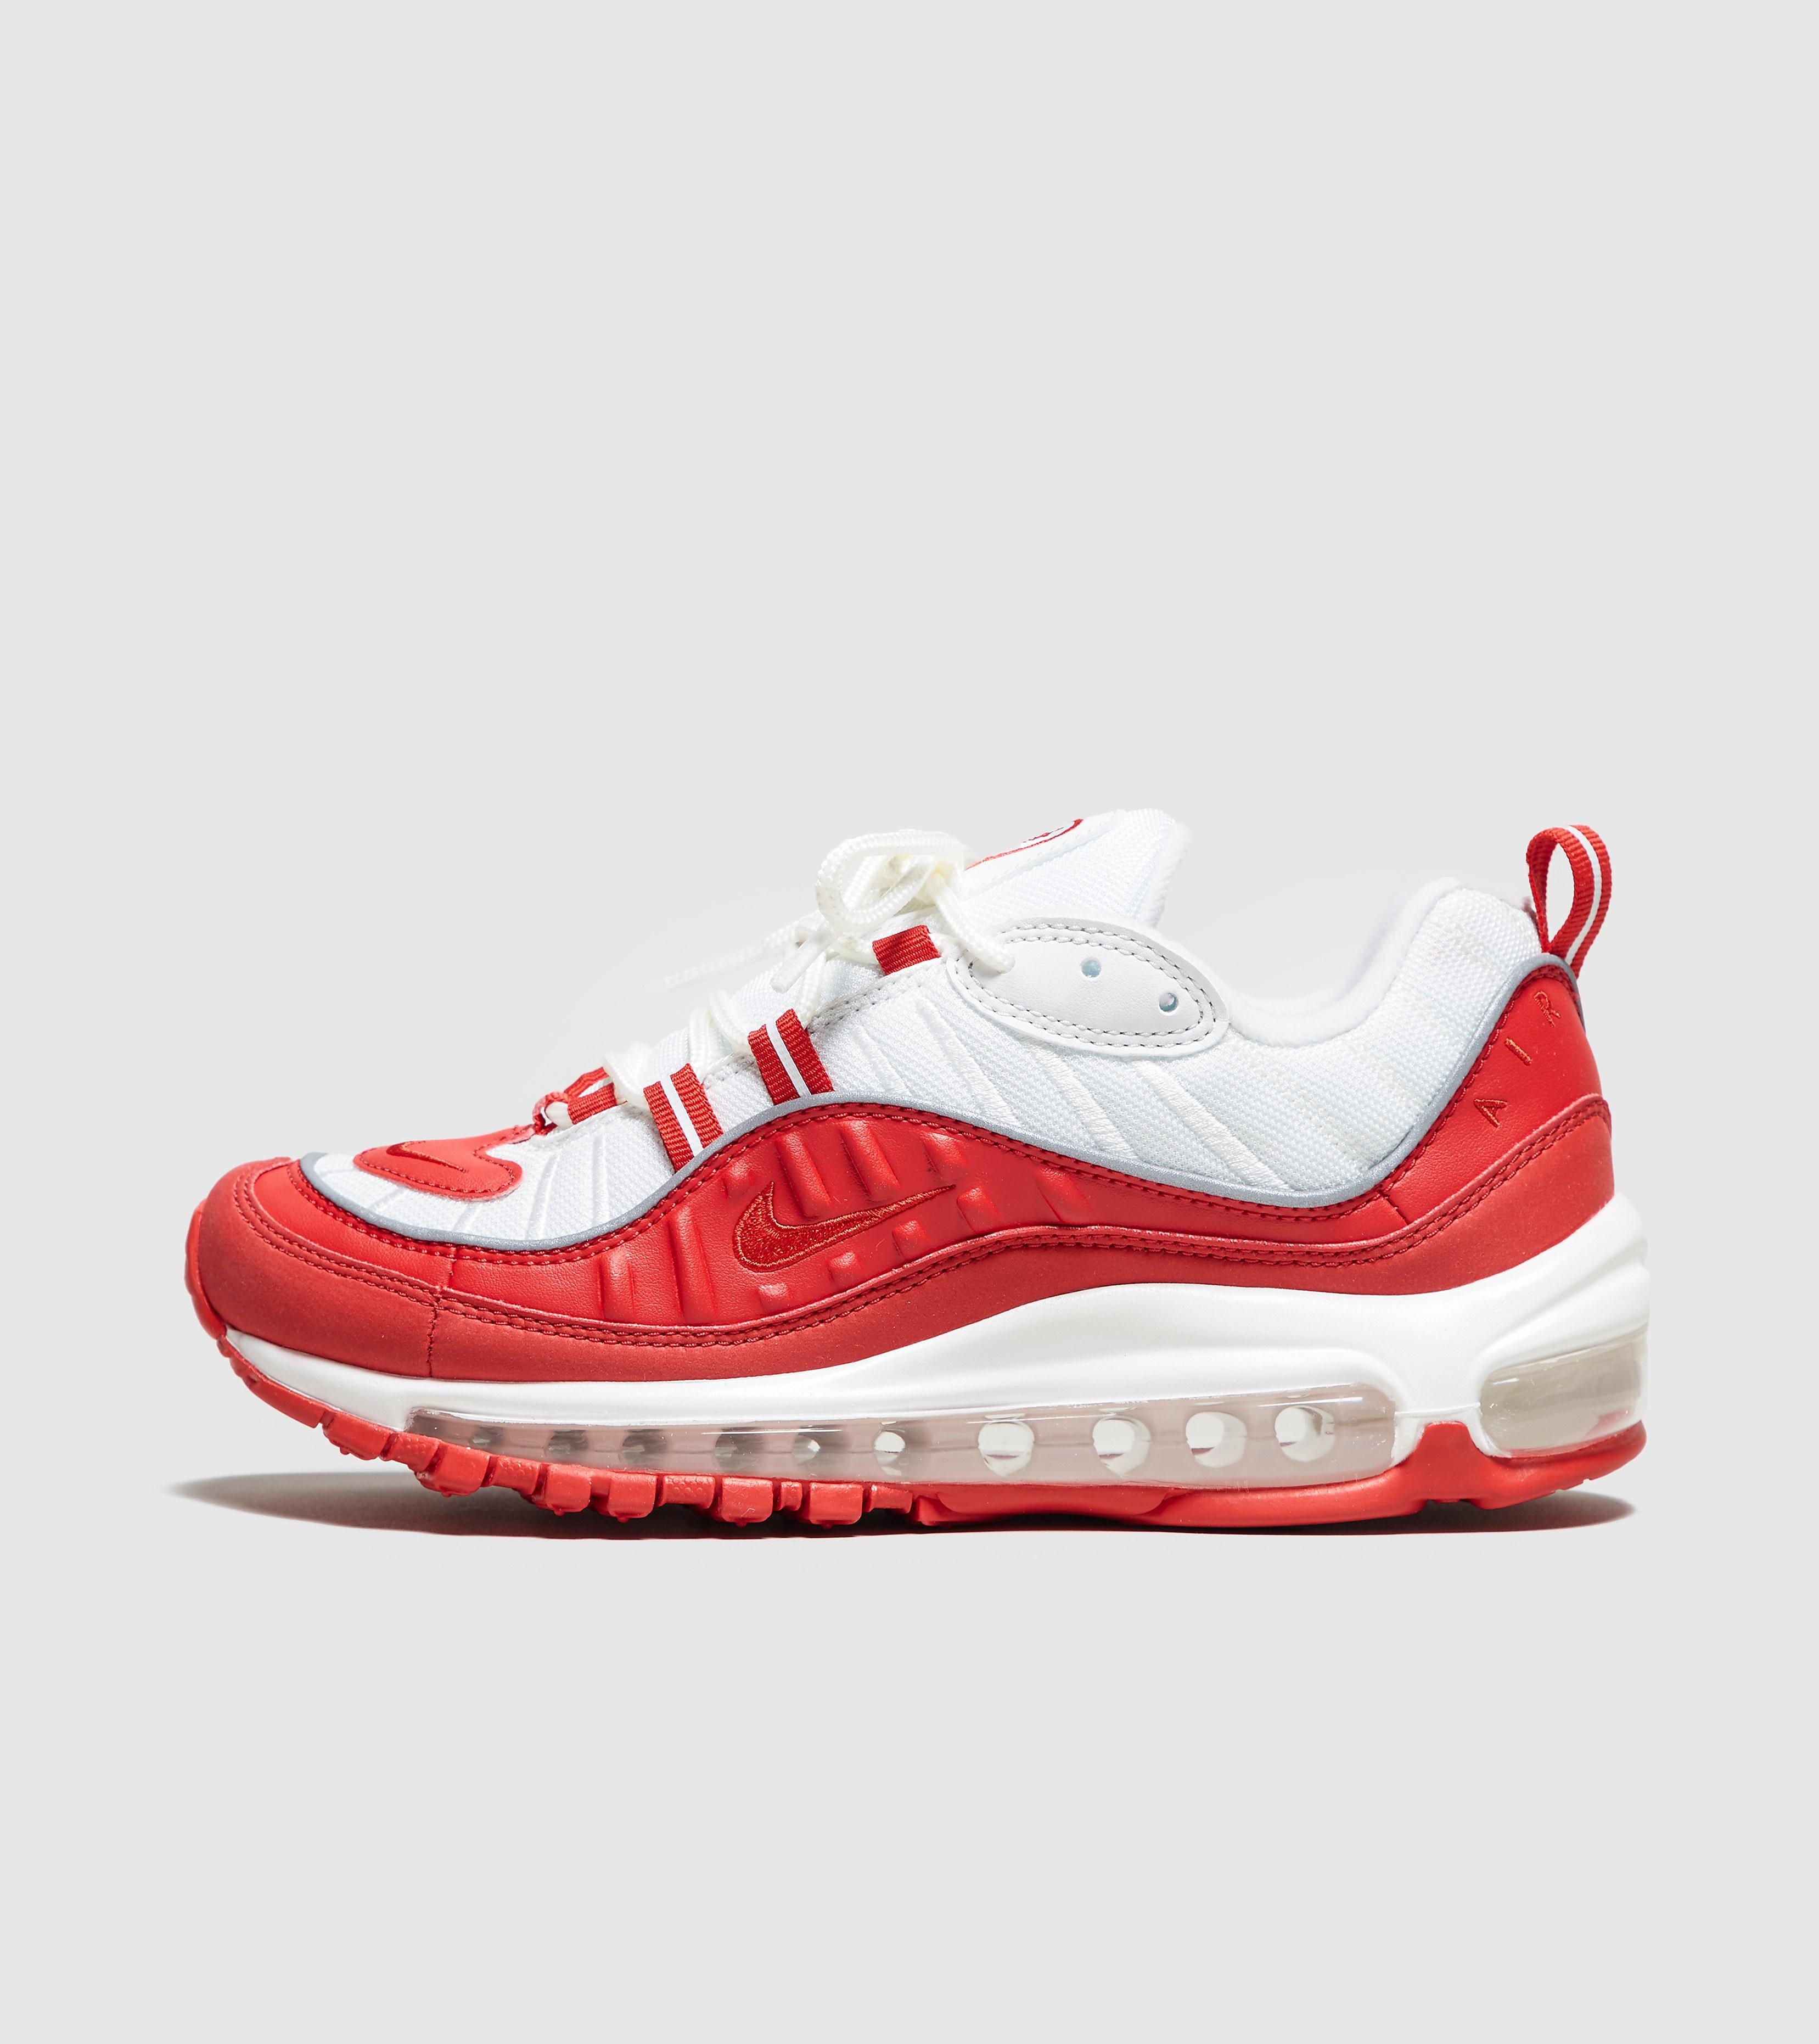 best sneakers 1a7de 56a11 Sneaker Nike Nike Air Max 98 SE Womens